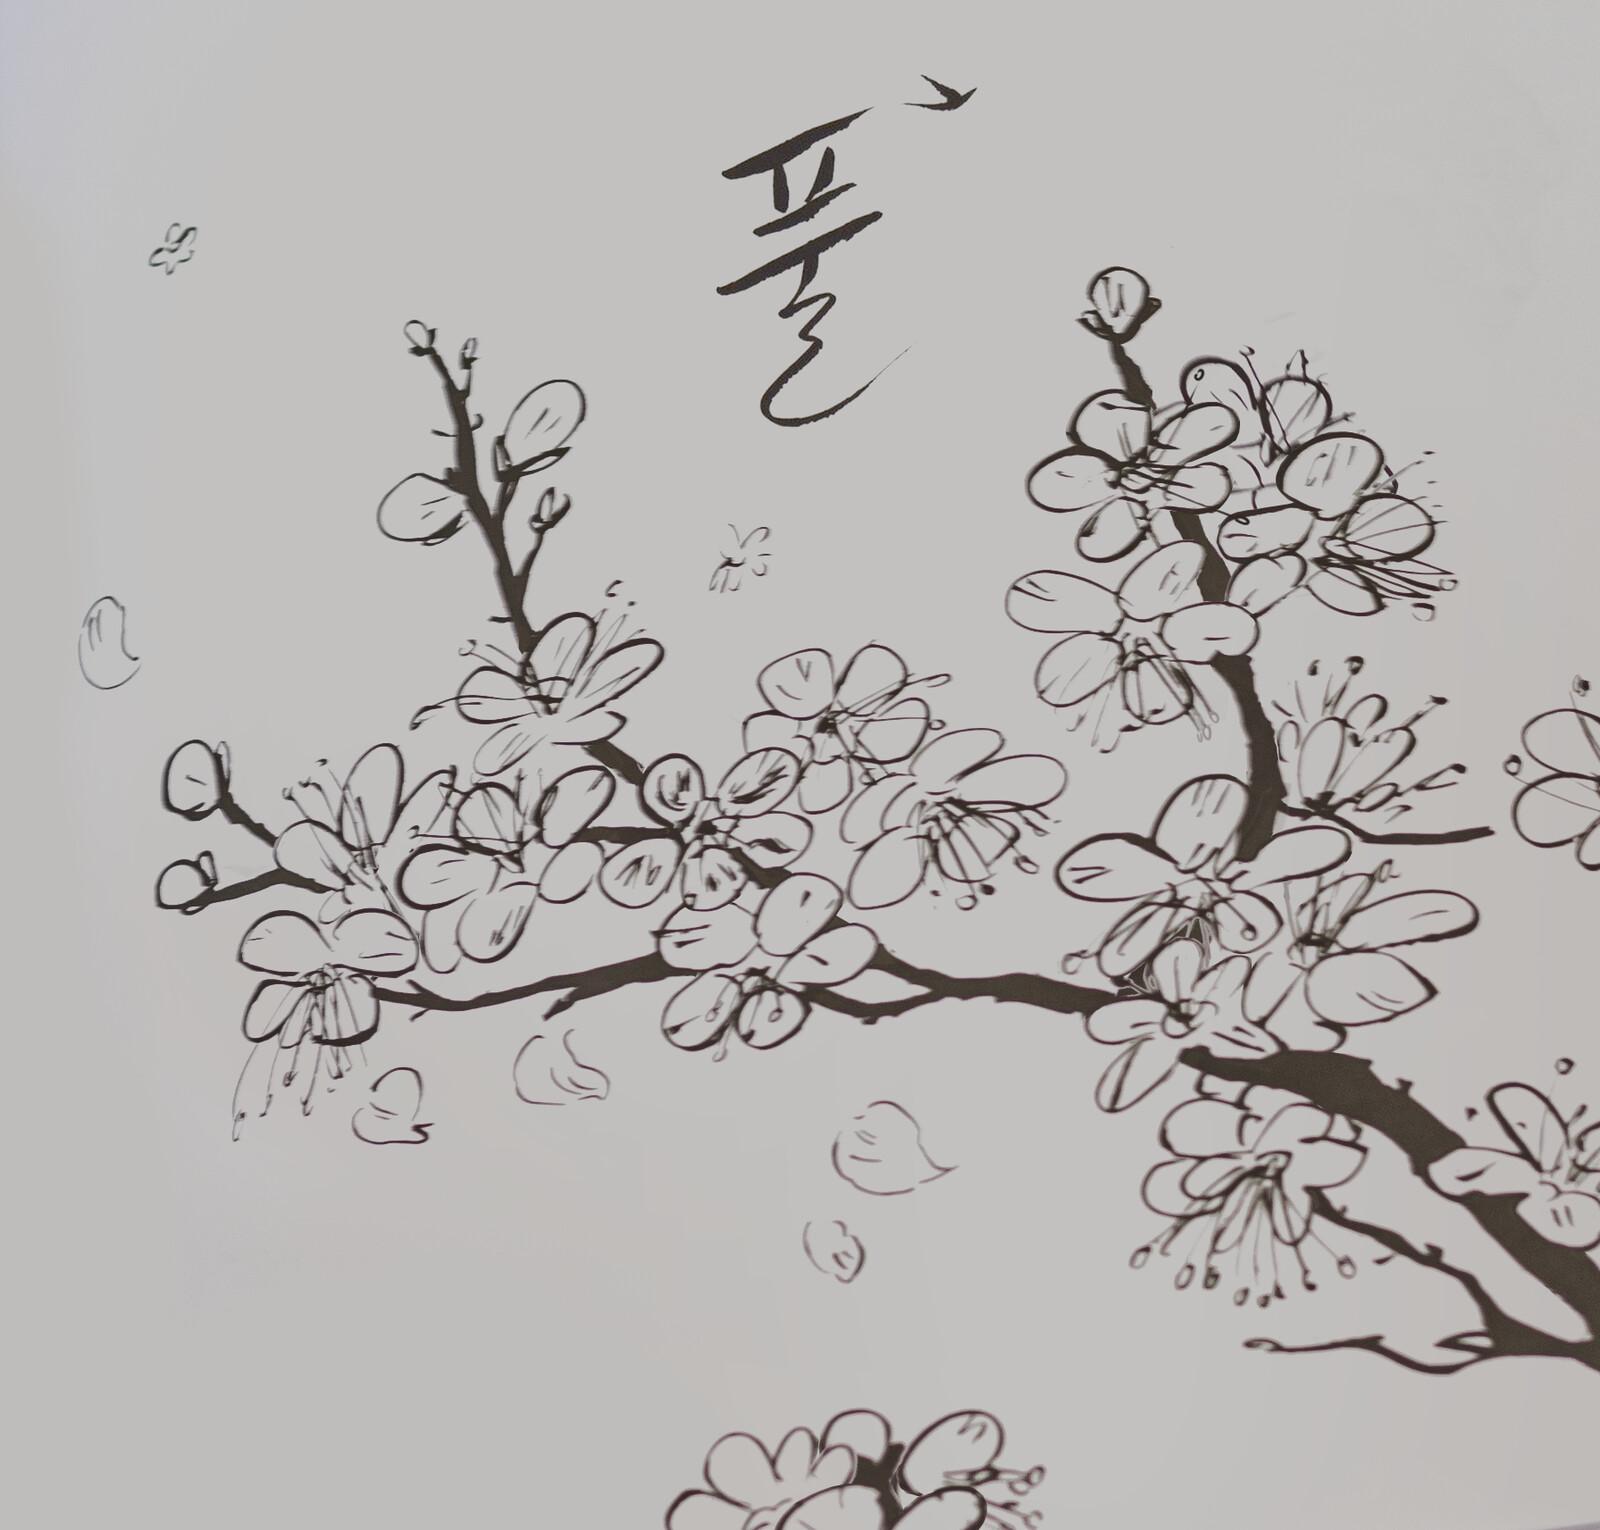 Grama [Fan made animation]